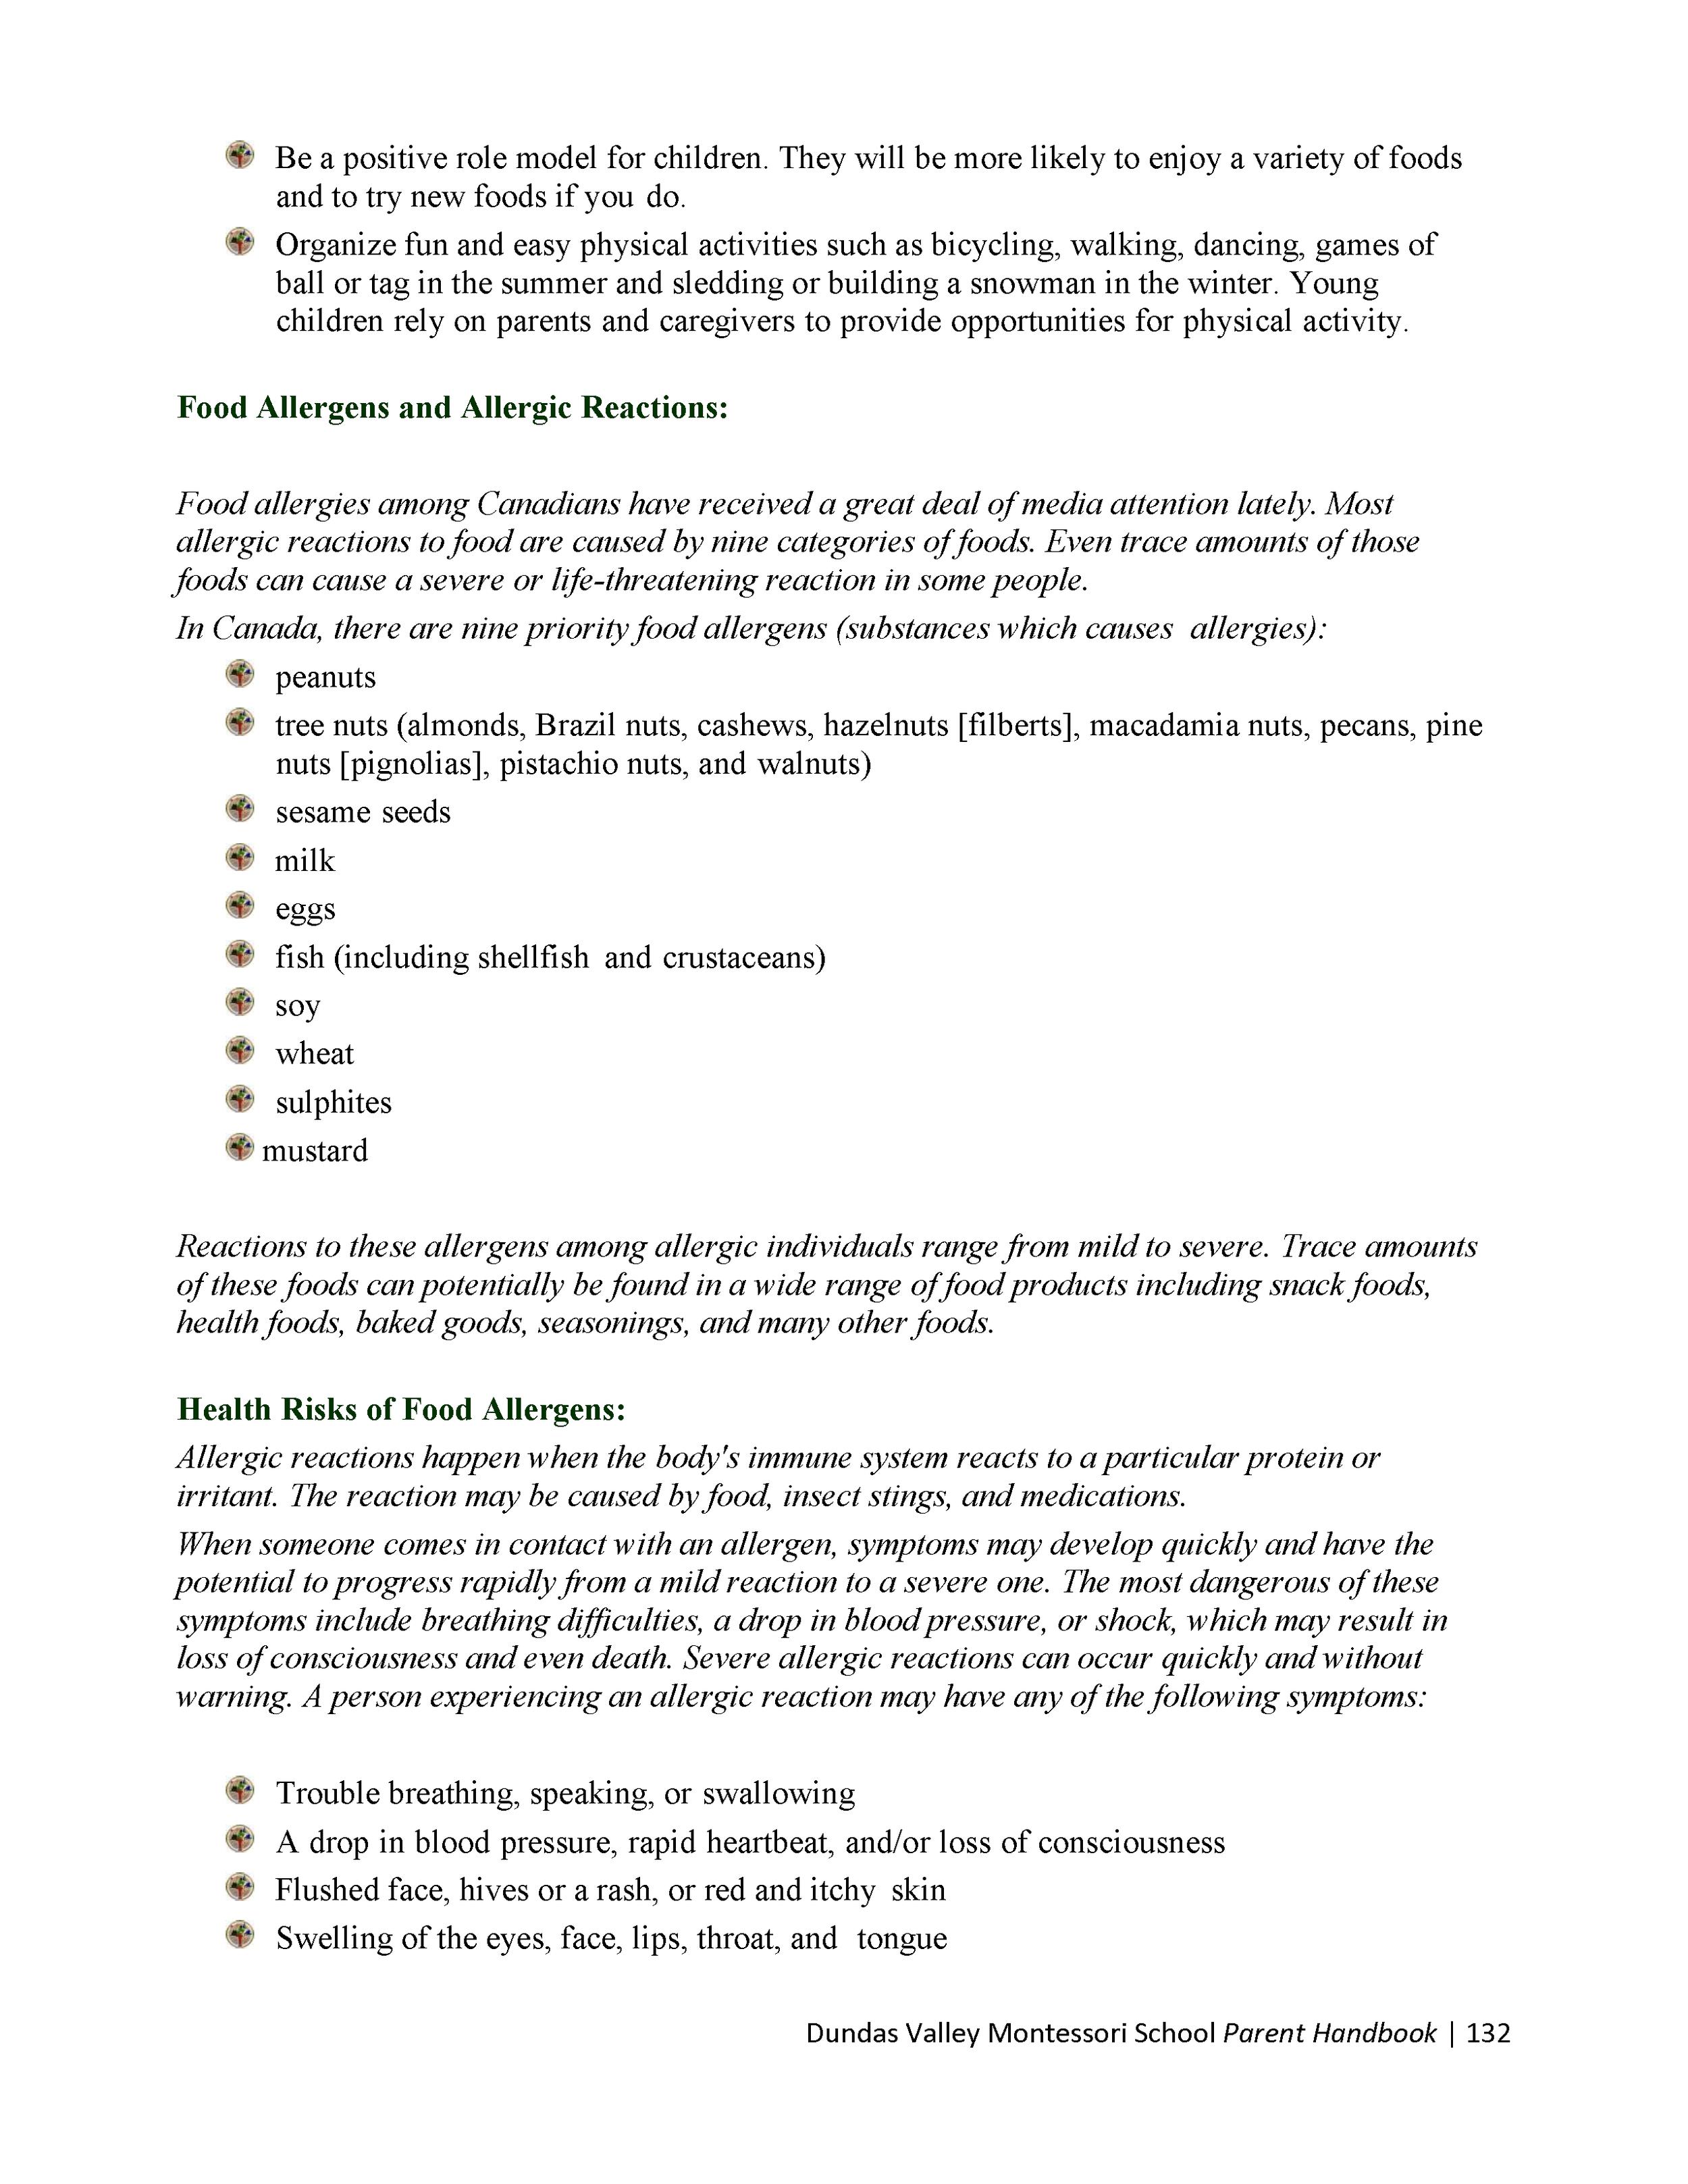 DVMS-Parent-Handbook-19-20_Page_134.png